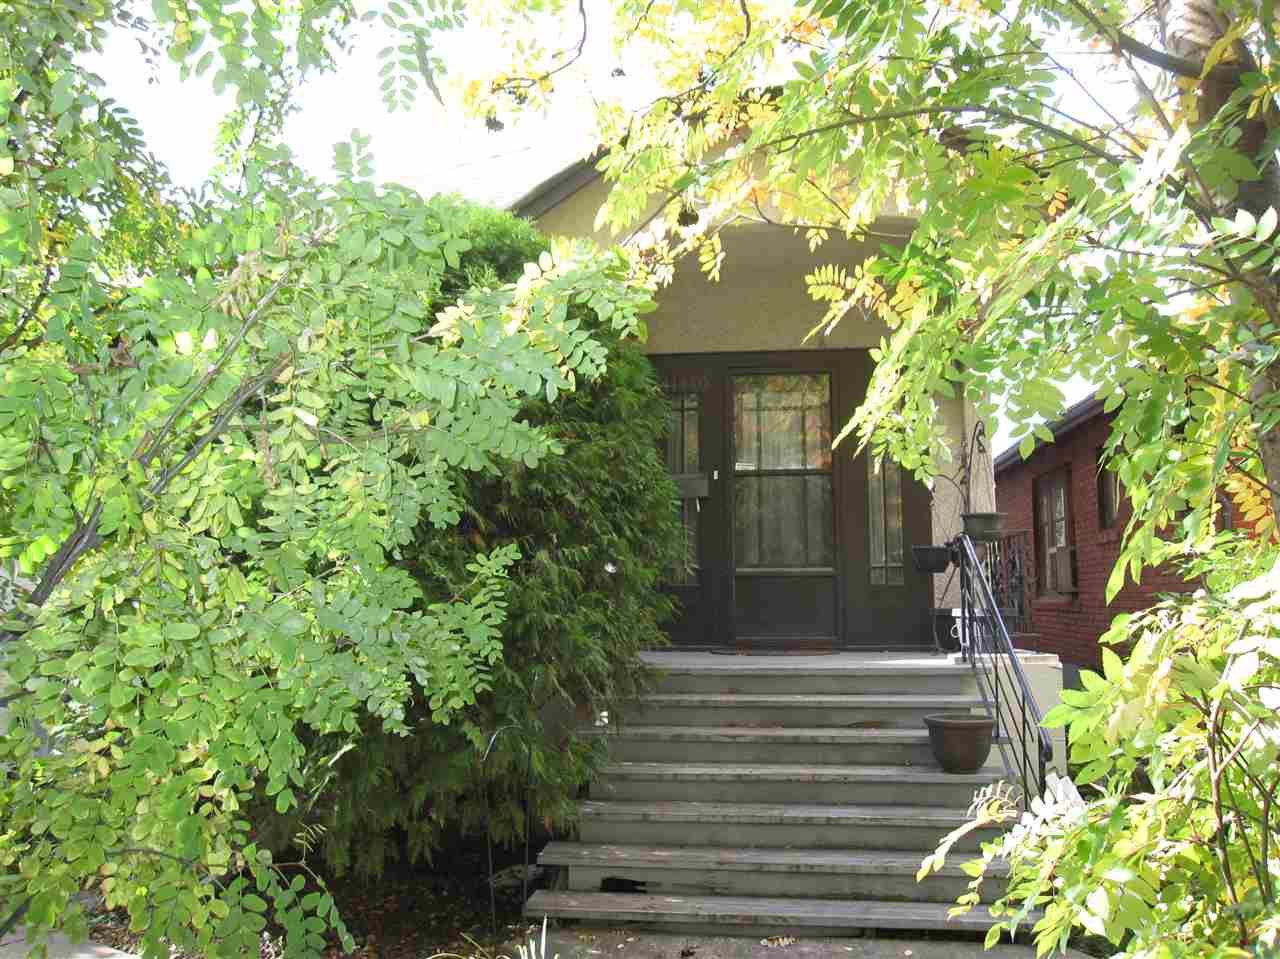 Main Photo: 11440 97 Street in Edmonton: Zone 08 House for sale : MLS®# E4174741